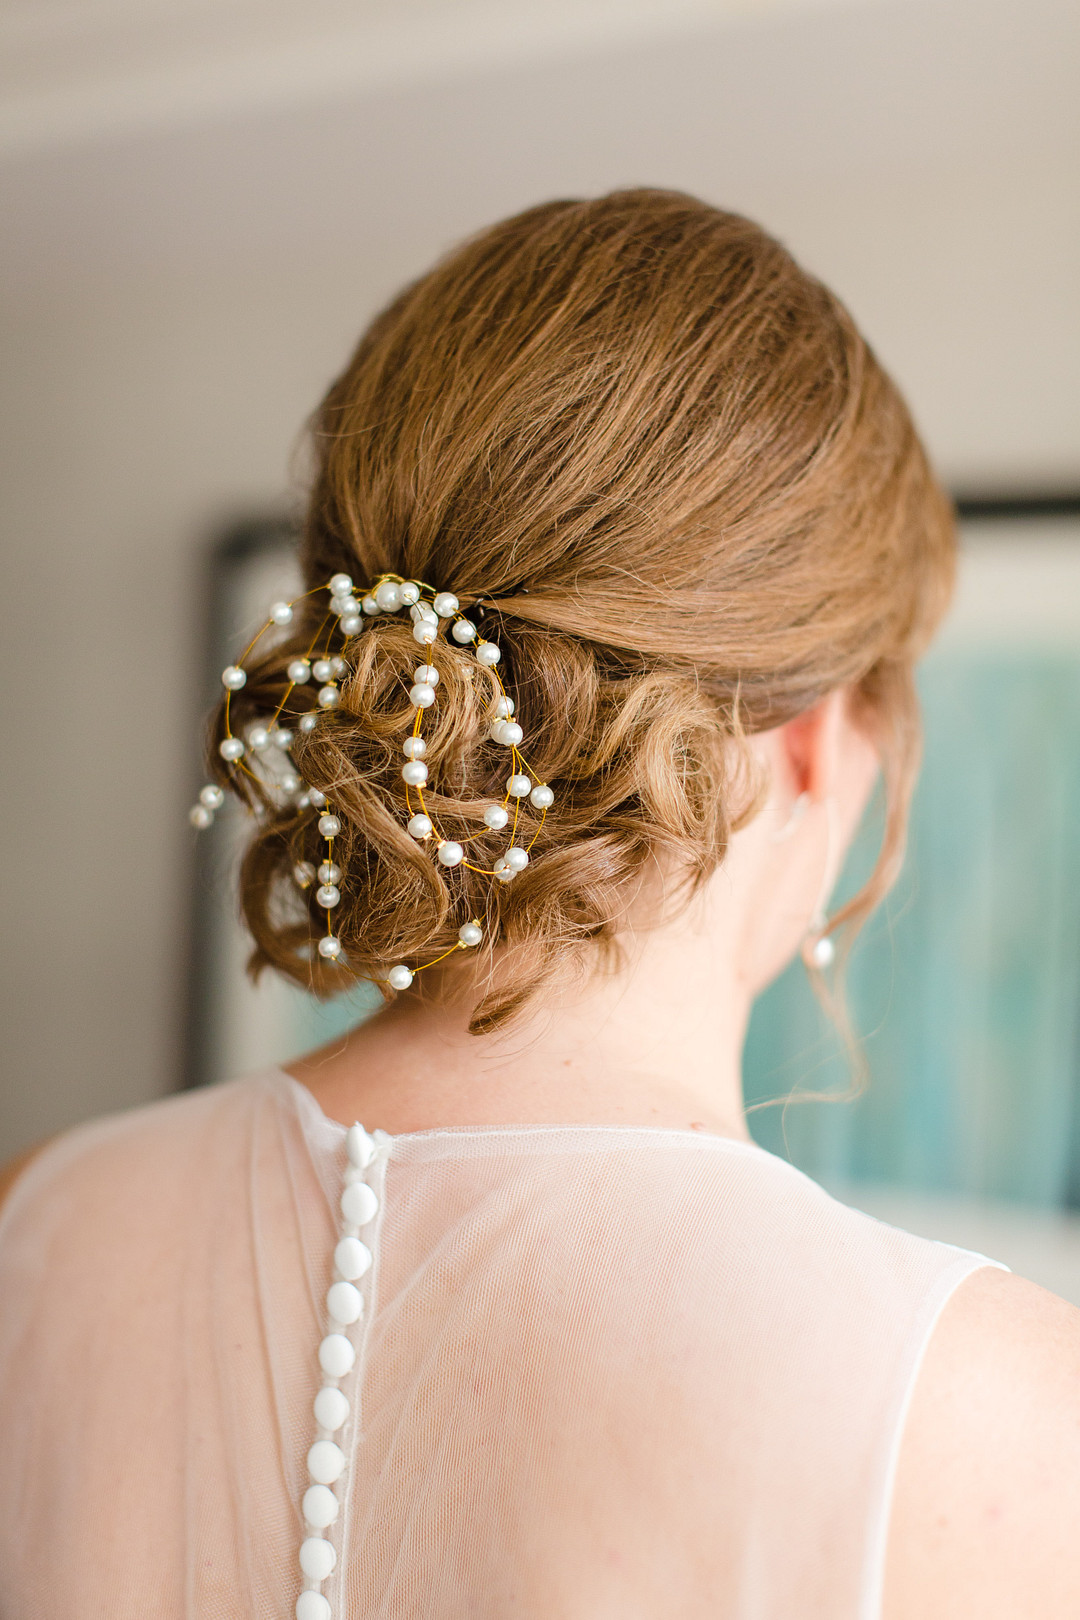 Deupree_Iorio_Megan Rei Photography_carlyle-house-wedding-megan-rei-photography-13_low